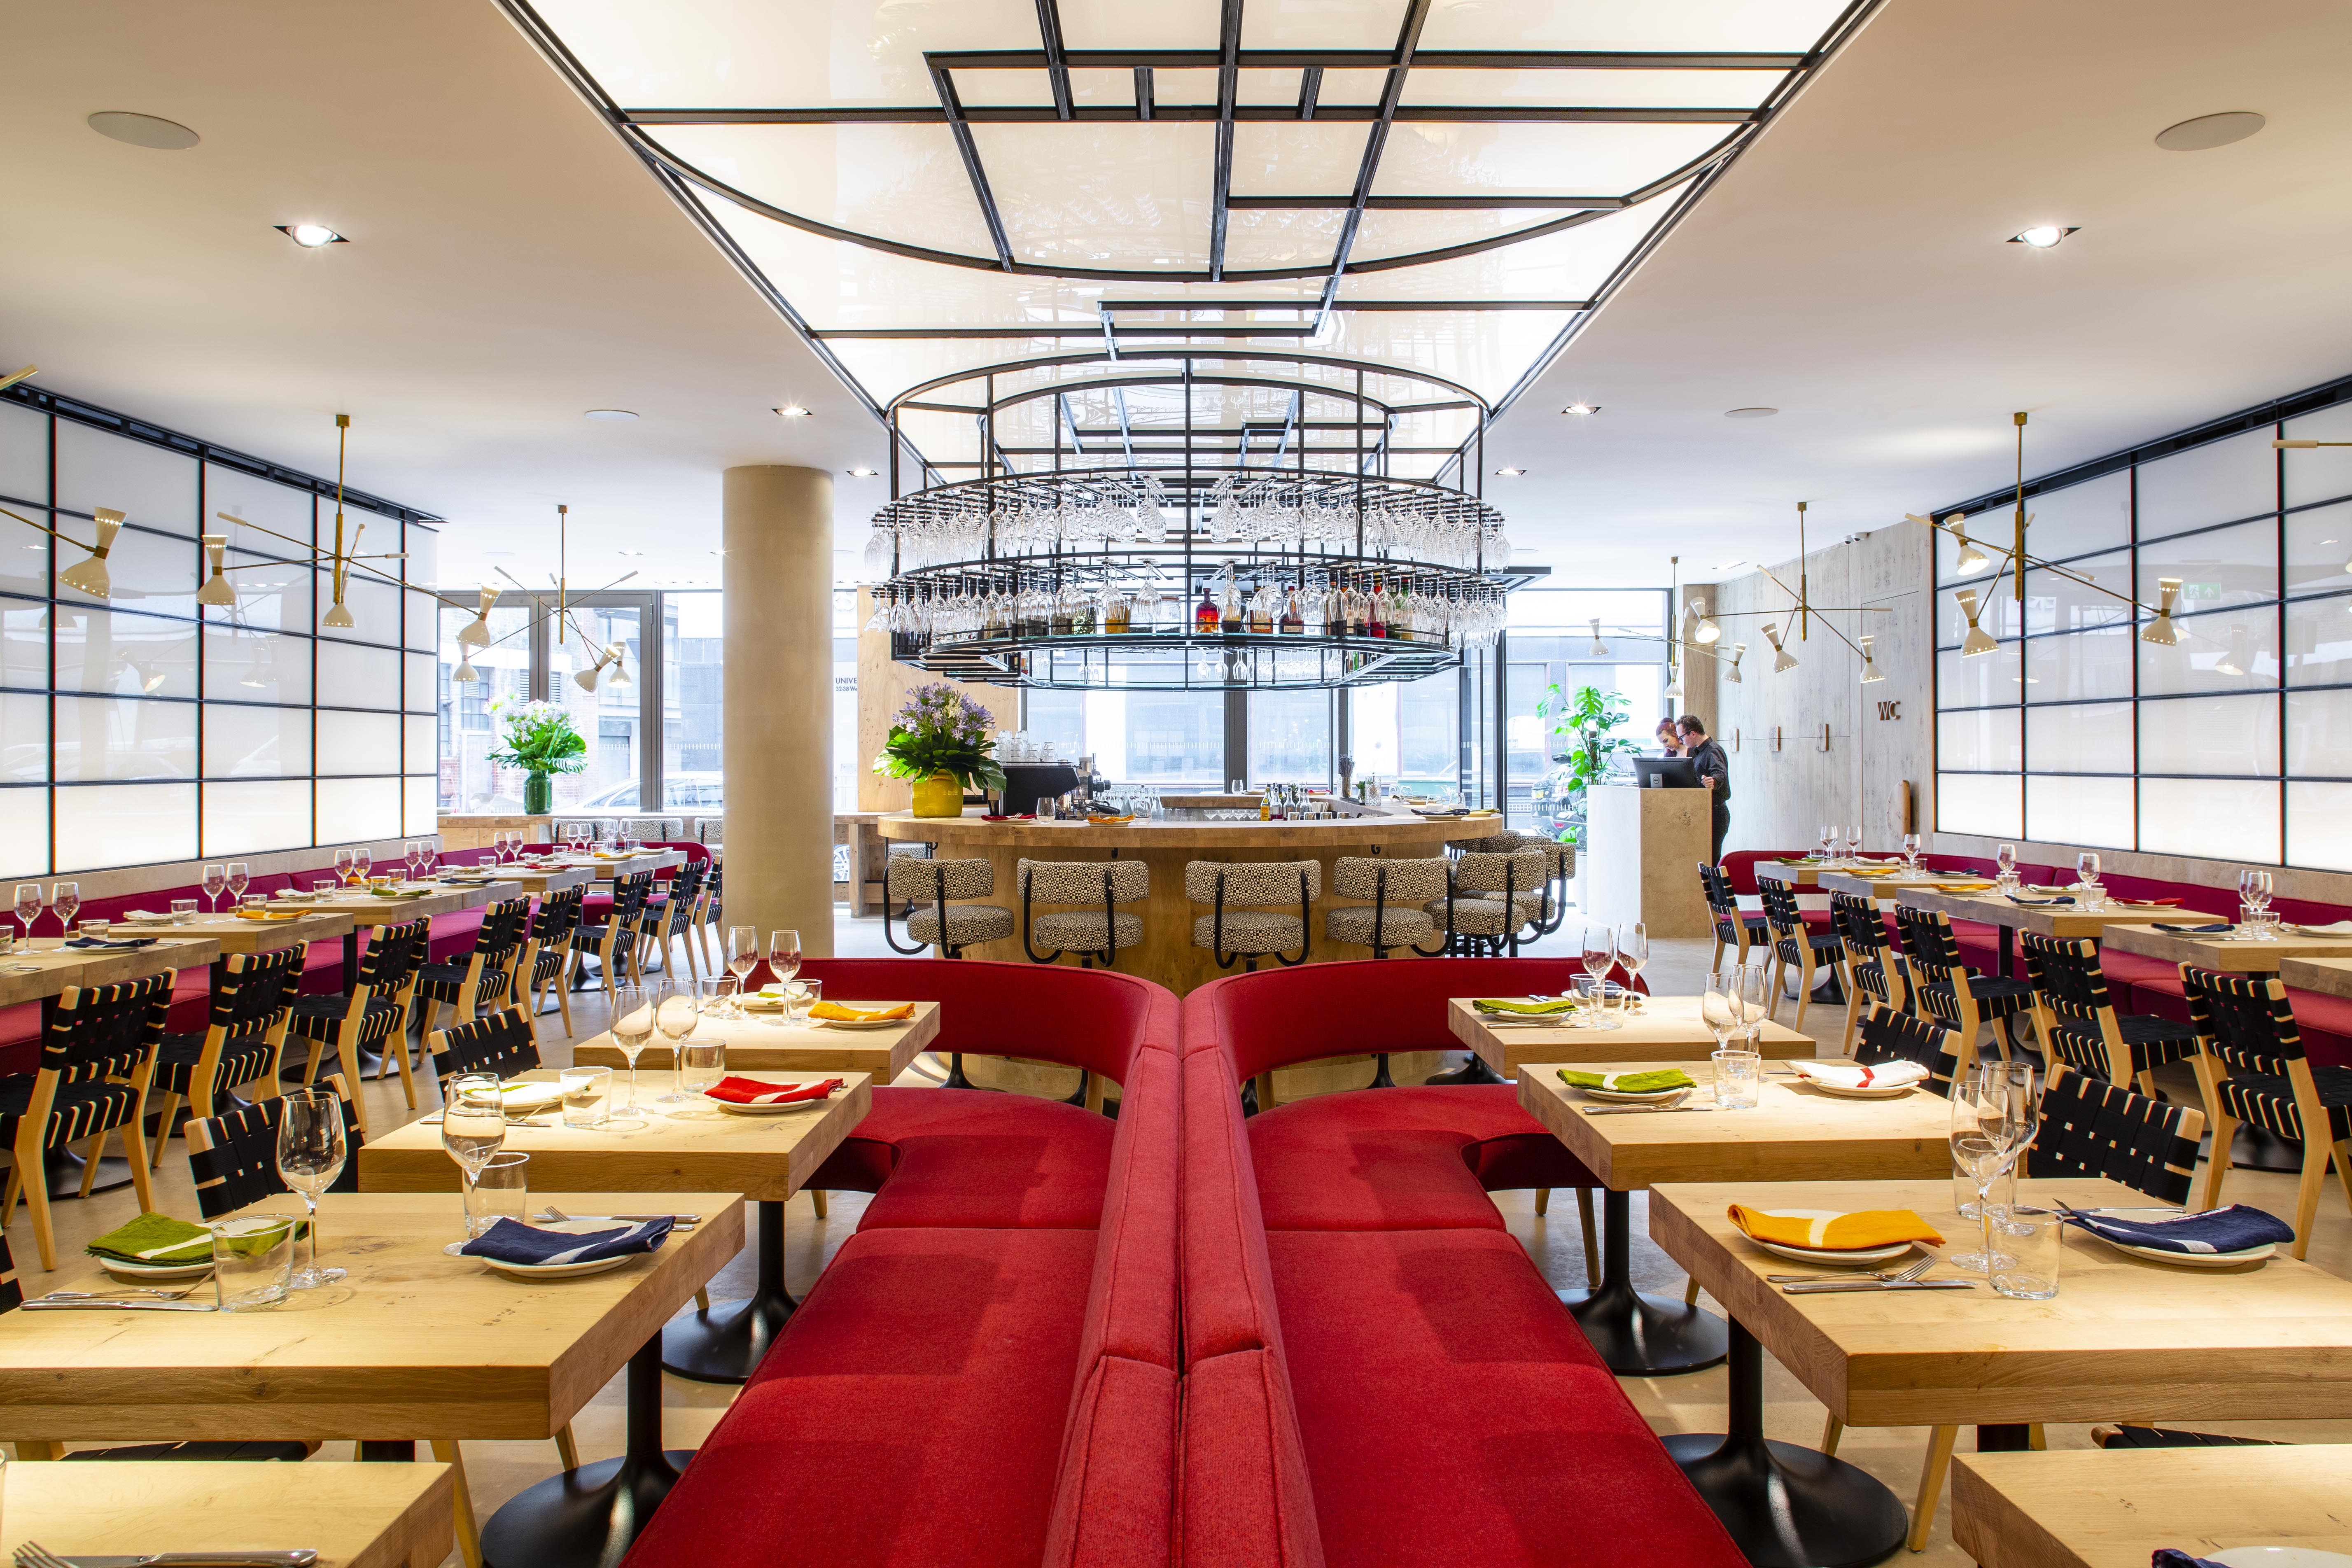 The sleek, symmetrical red interior at Ottolenghi's new restaurant, Rovi